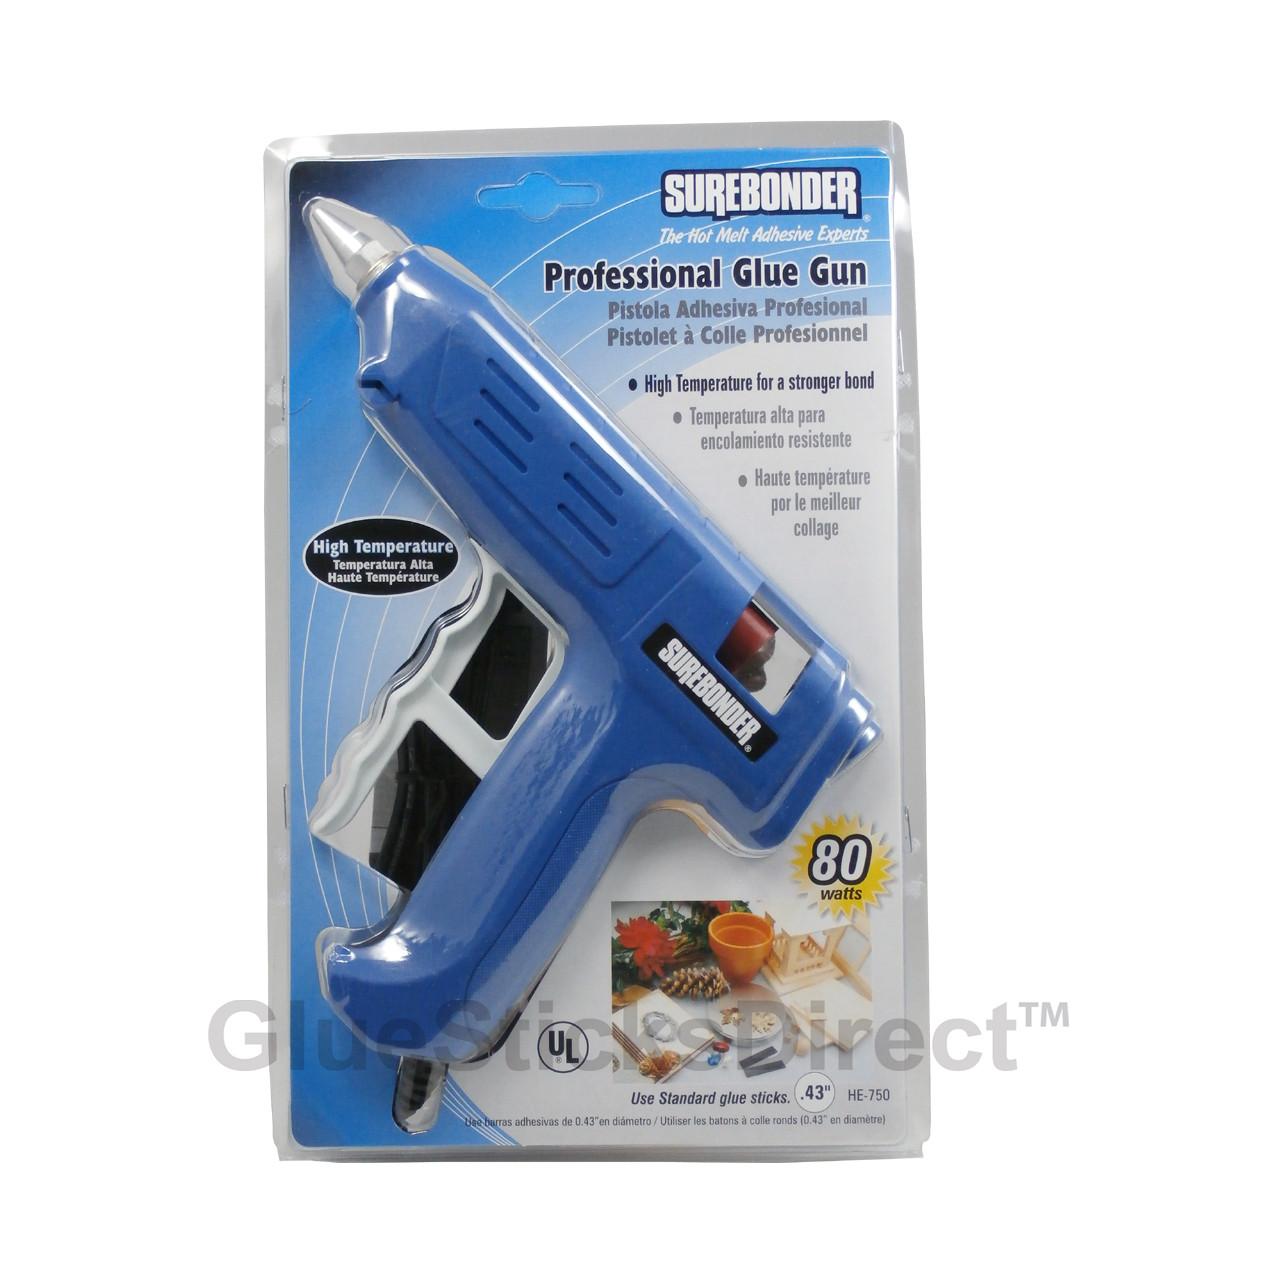 Surebonder HE-750 High Temperature Professional Glue Gun 80 Watts